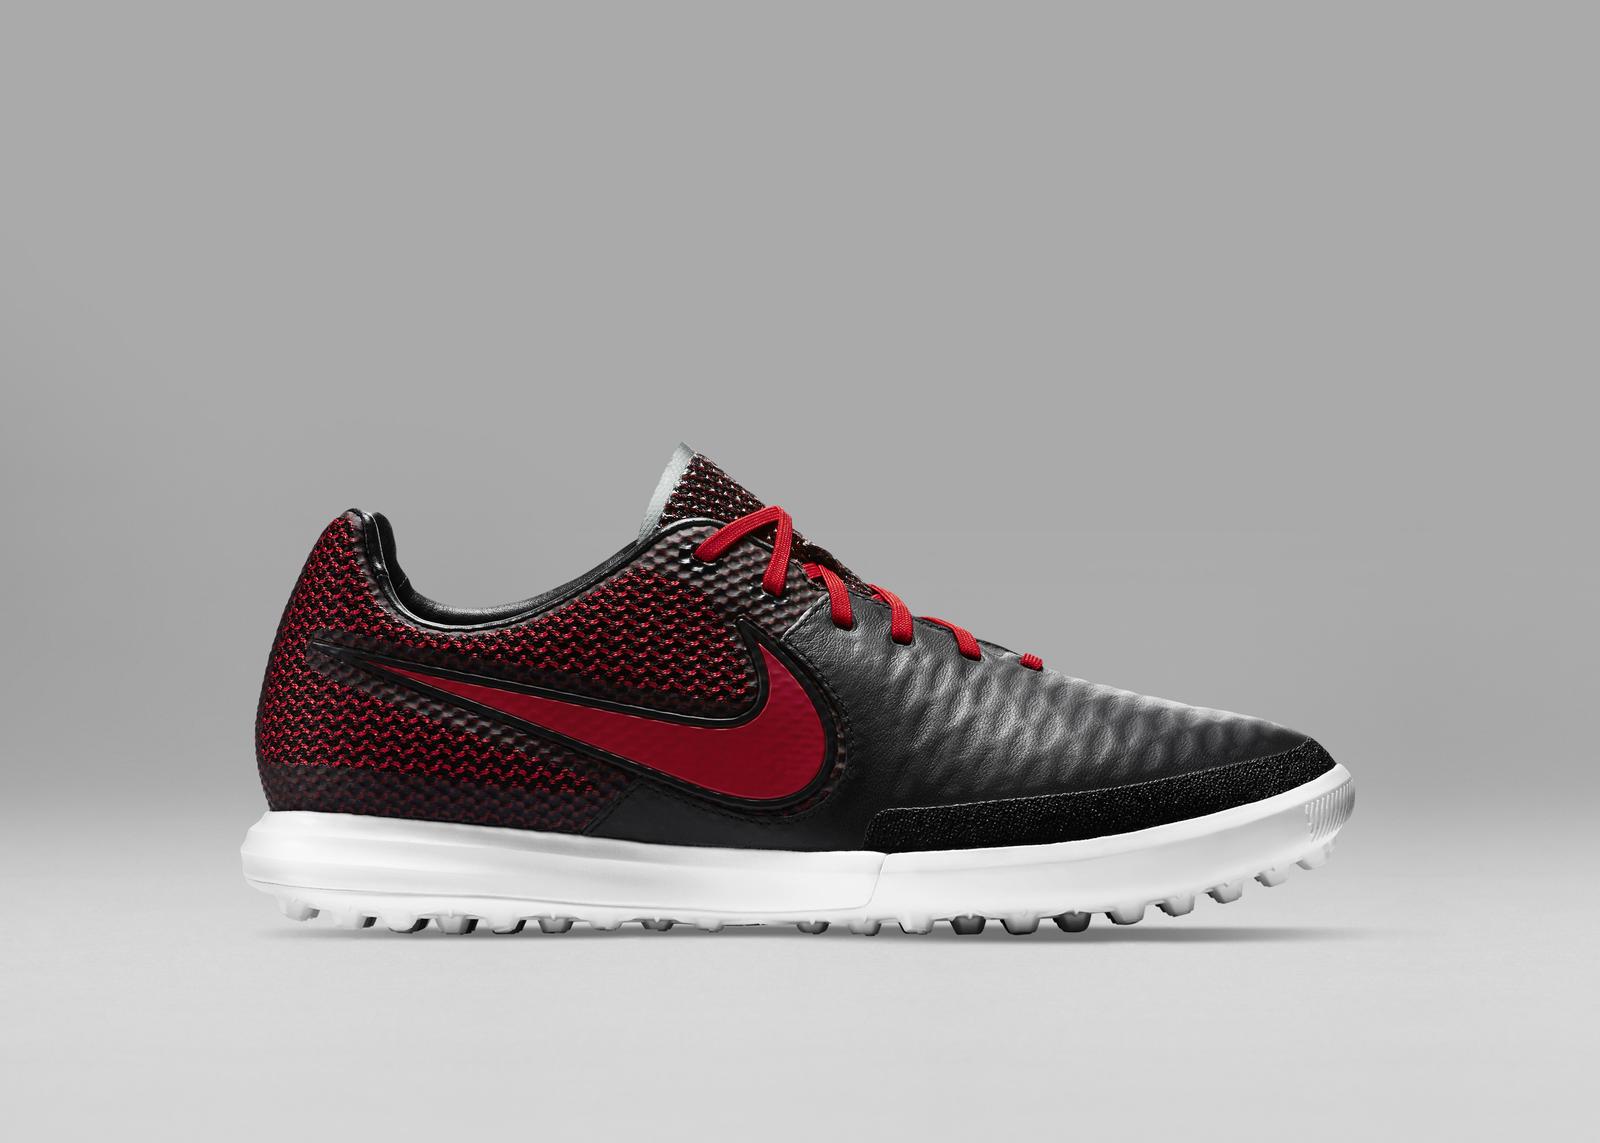 Nike-Football-Soccer_NFX_STREET_MAGISTAX_FINALE_TF_A_PREM